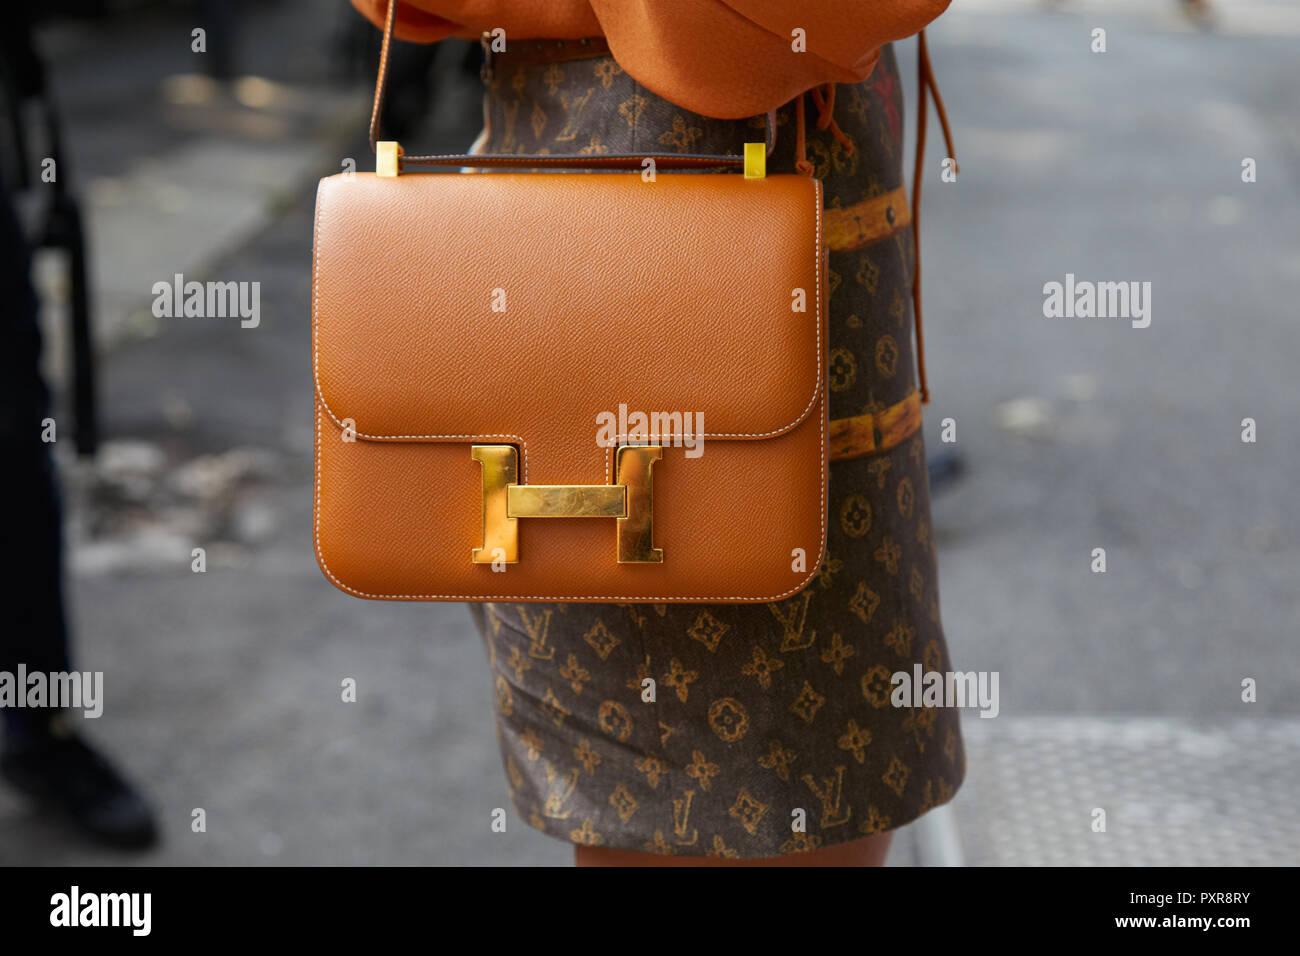 faa28501 Hermes Bag Stock Photos & Hermes Bag Stock Images - Alamy